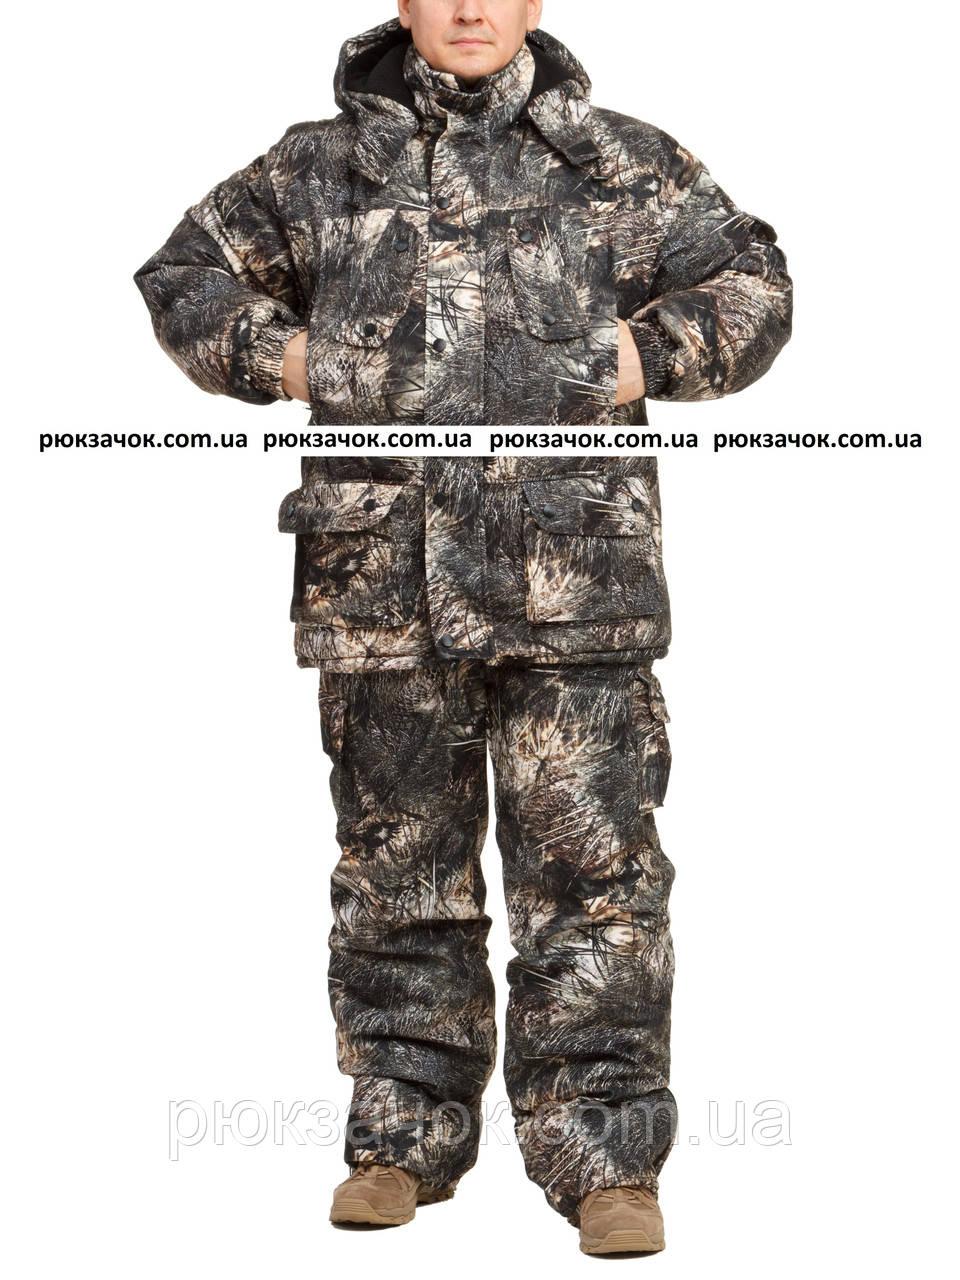 "Охотничий костюм на зиму, из нешуршащей, дышащей ткани ""Сокол"" размер 60-62"